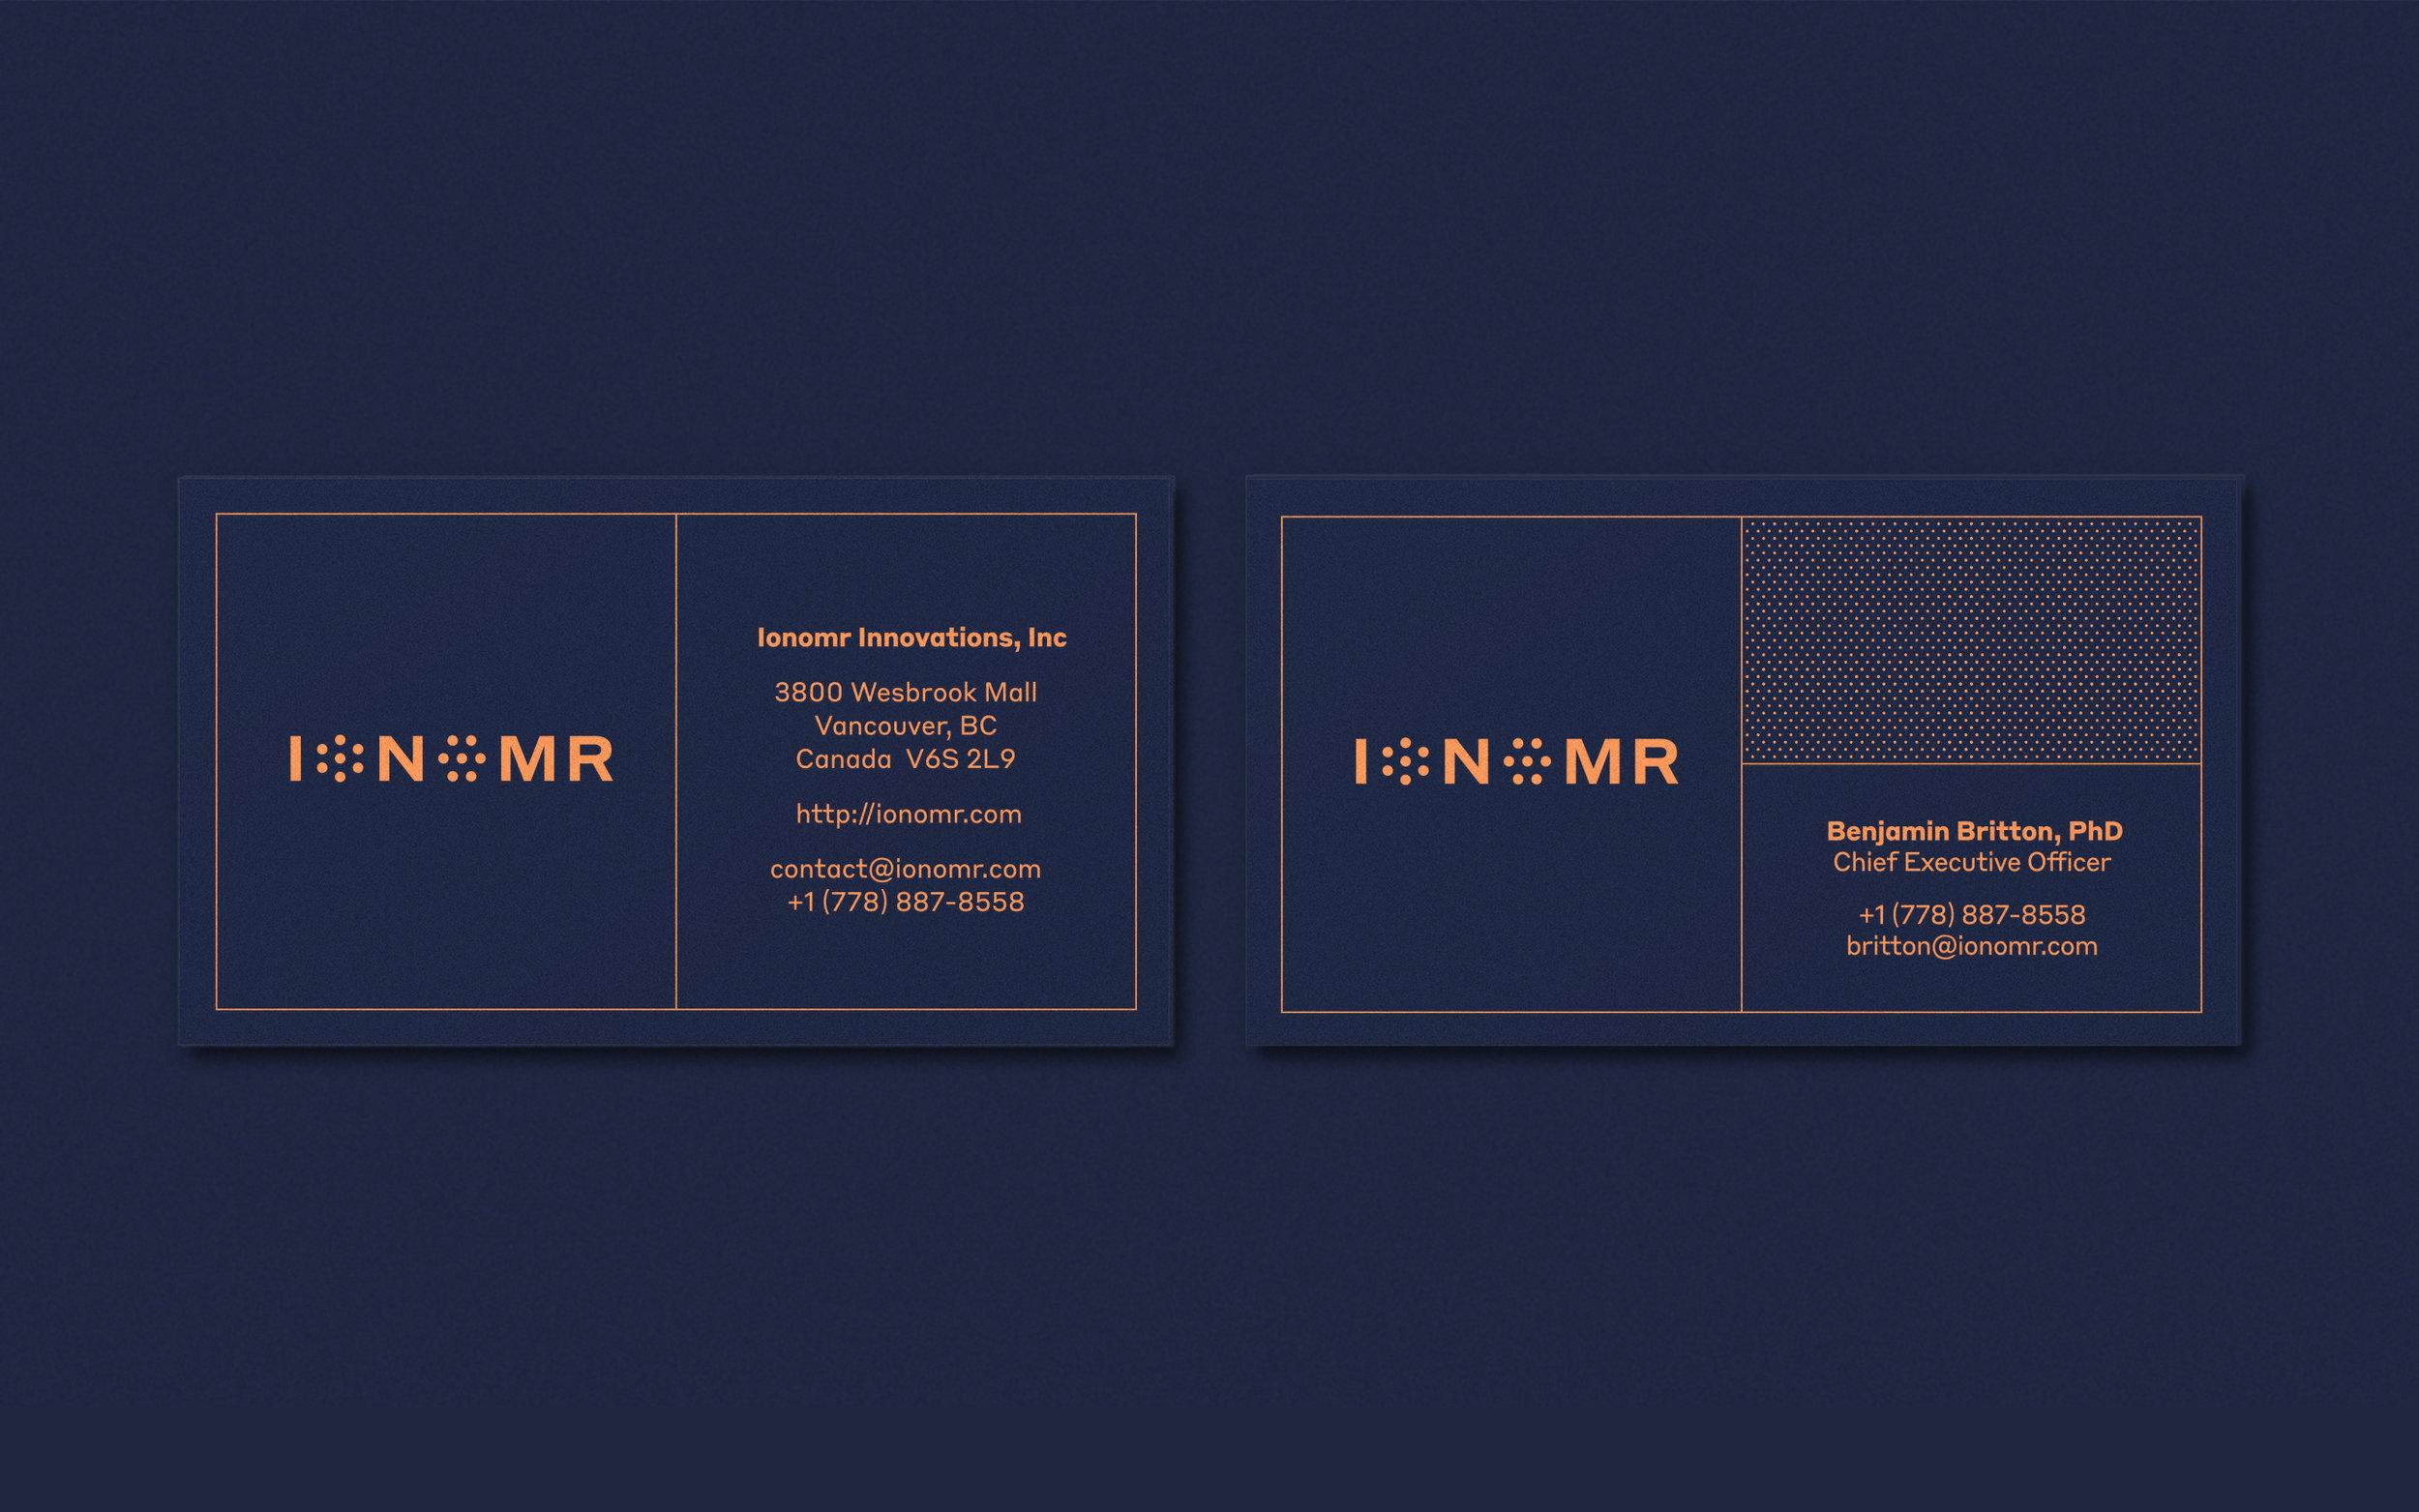 HM_Website_ION_Cards01.jpg